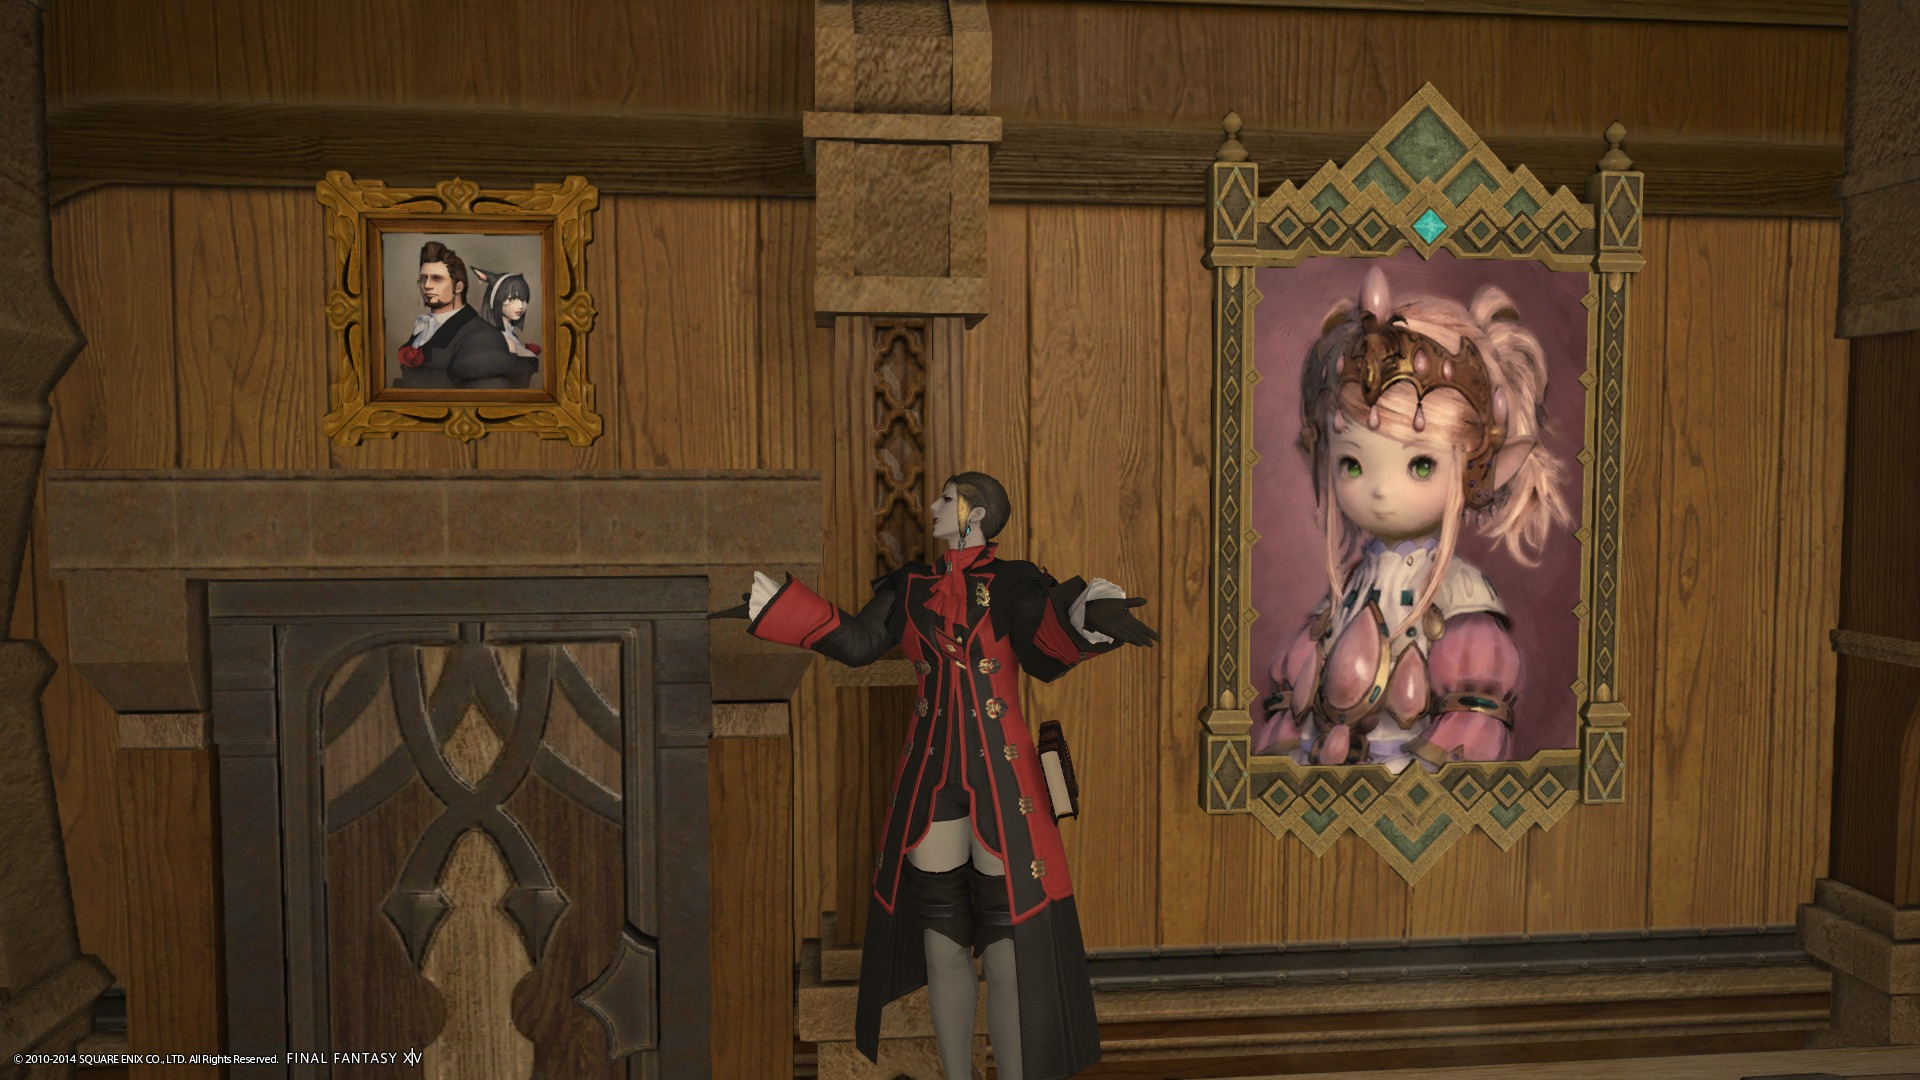 事件屋の肖像画